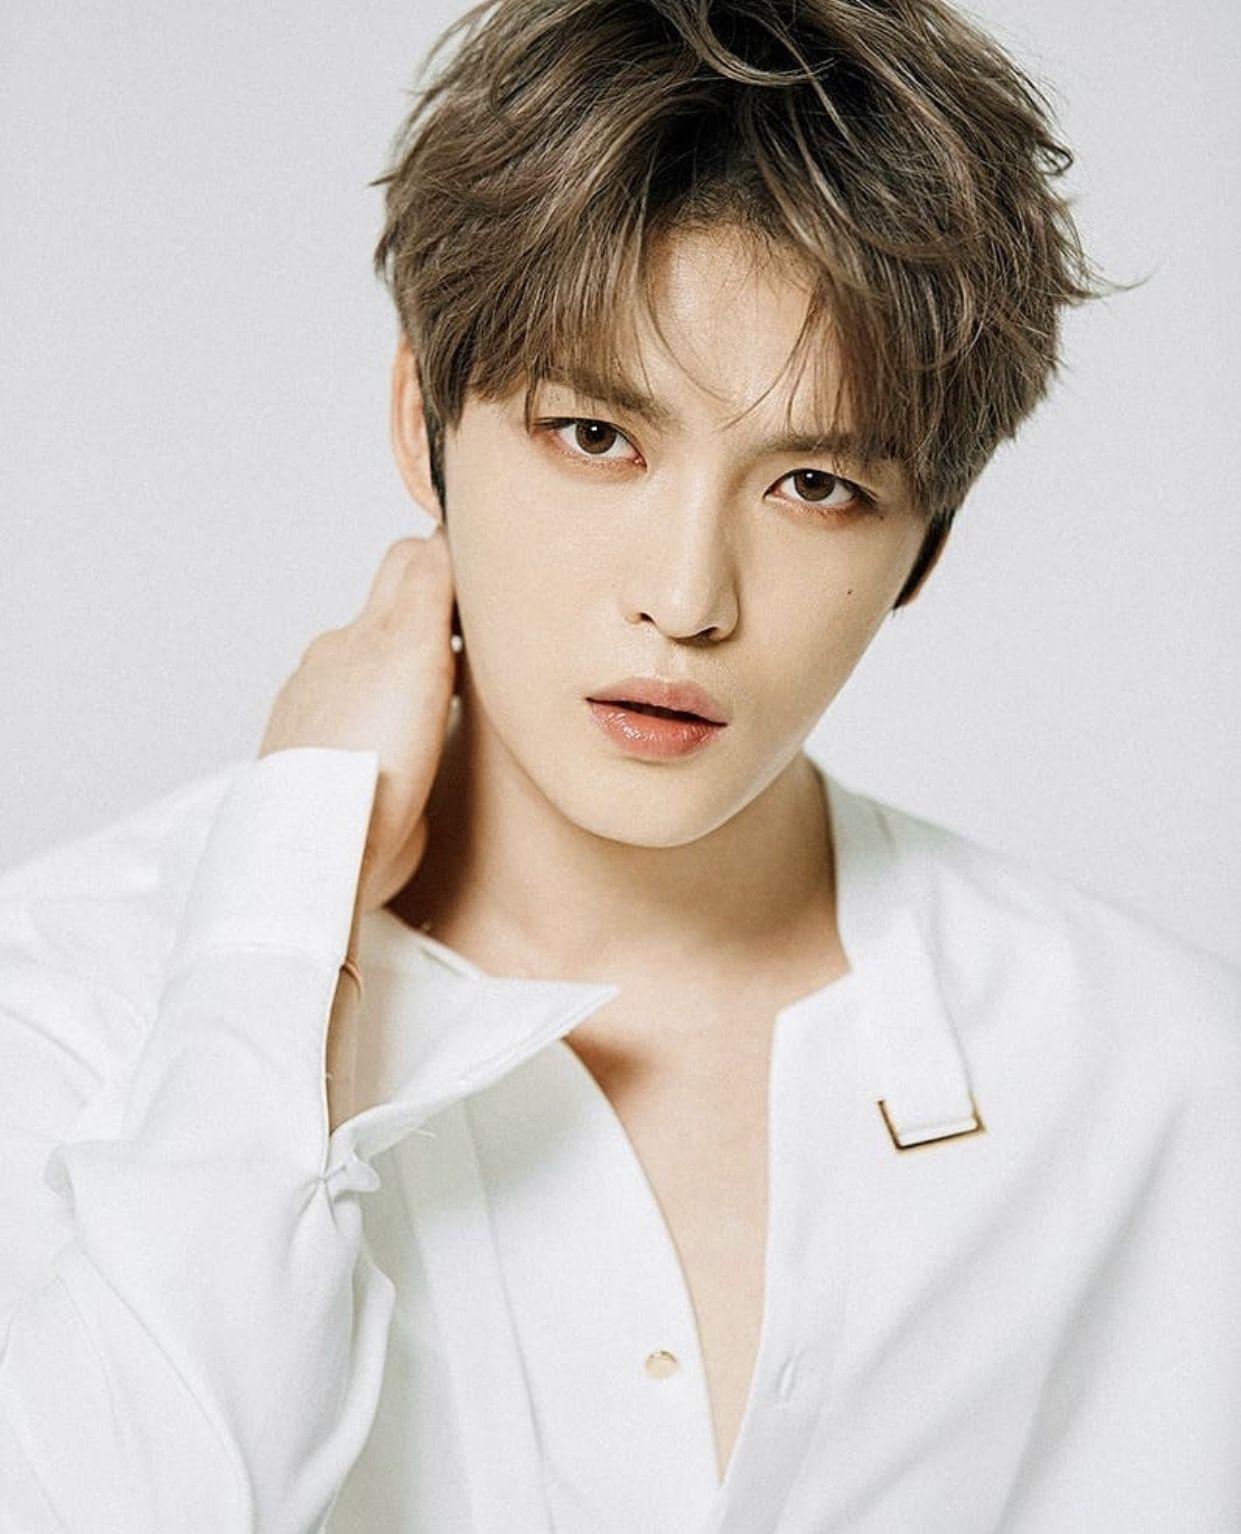 Jaejoong Jaejoong Perfect Jawline Jyj